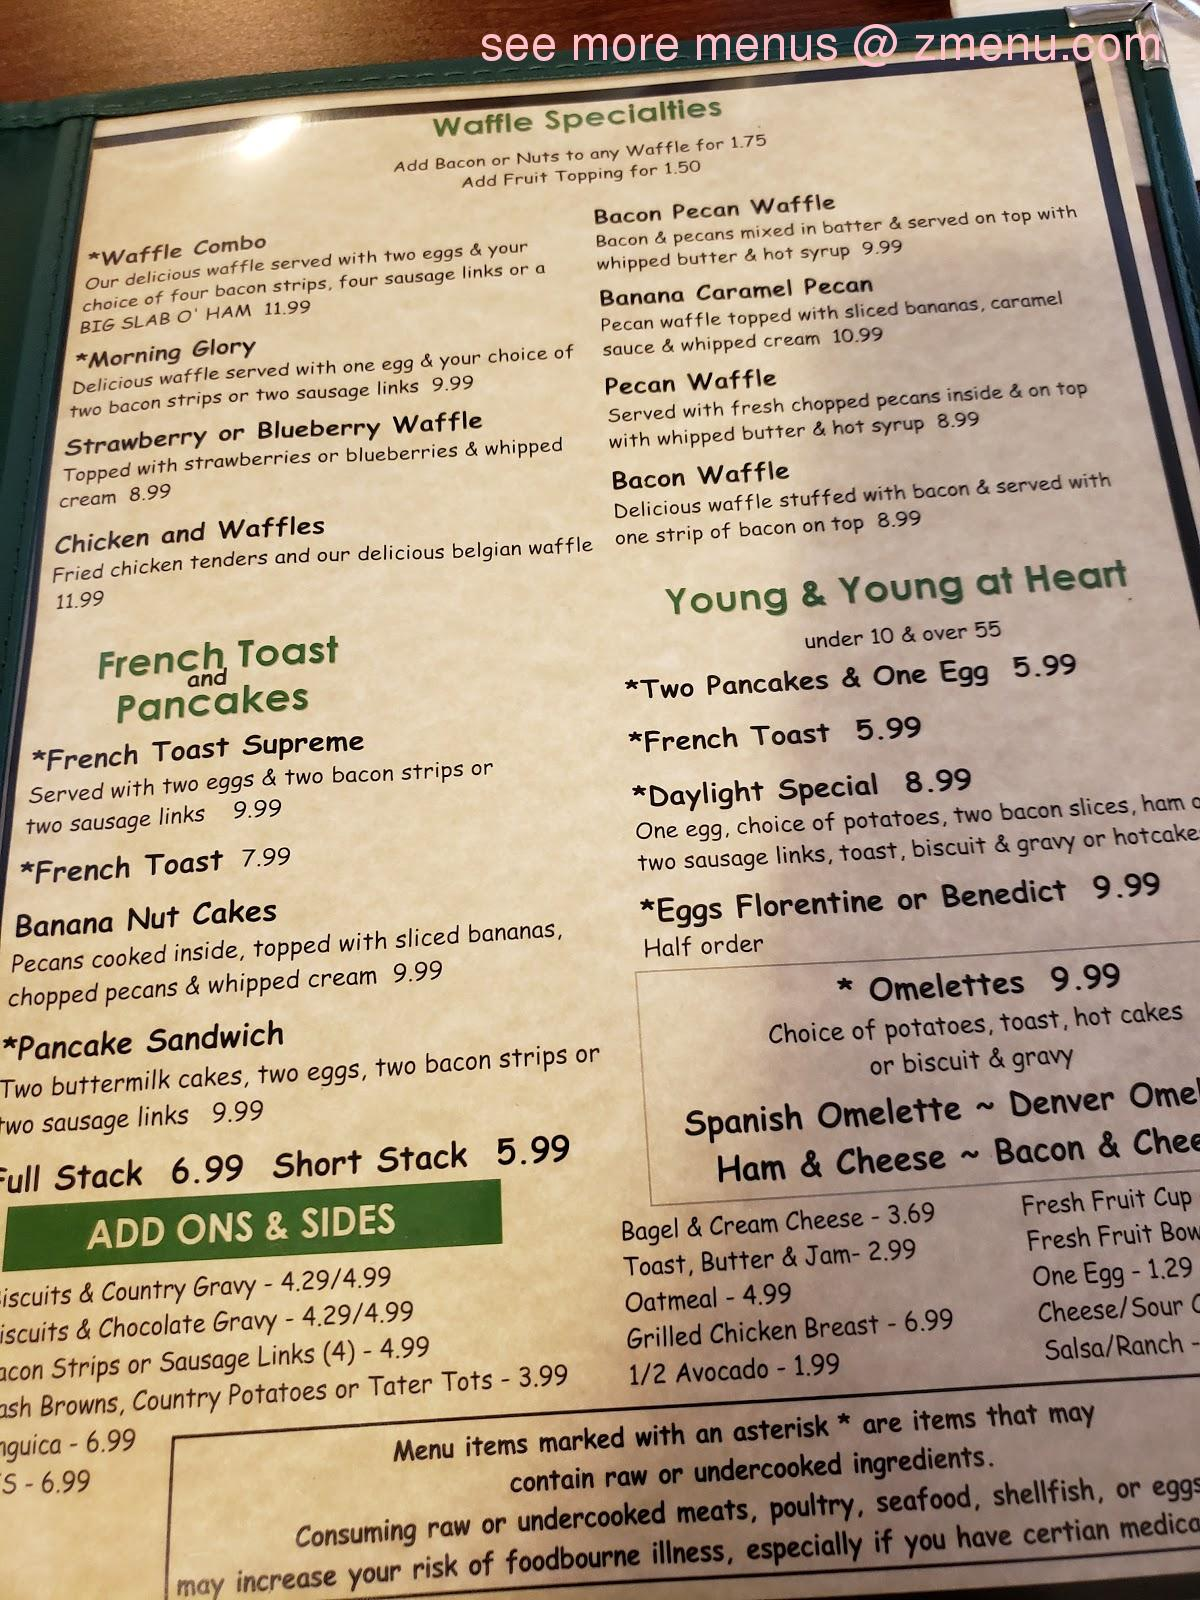 Online Menu Of My Garden Cafe Restaurant Turlock California 95380 Zmenu